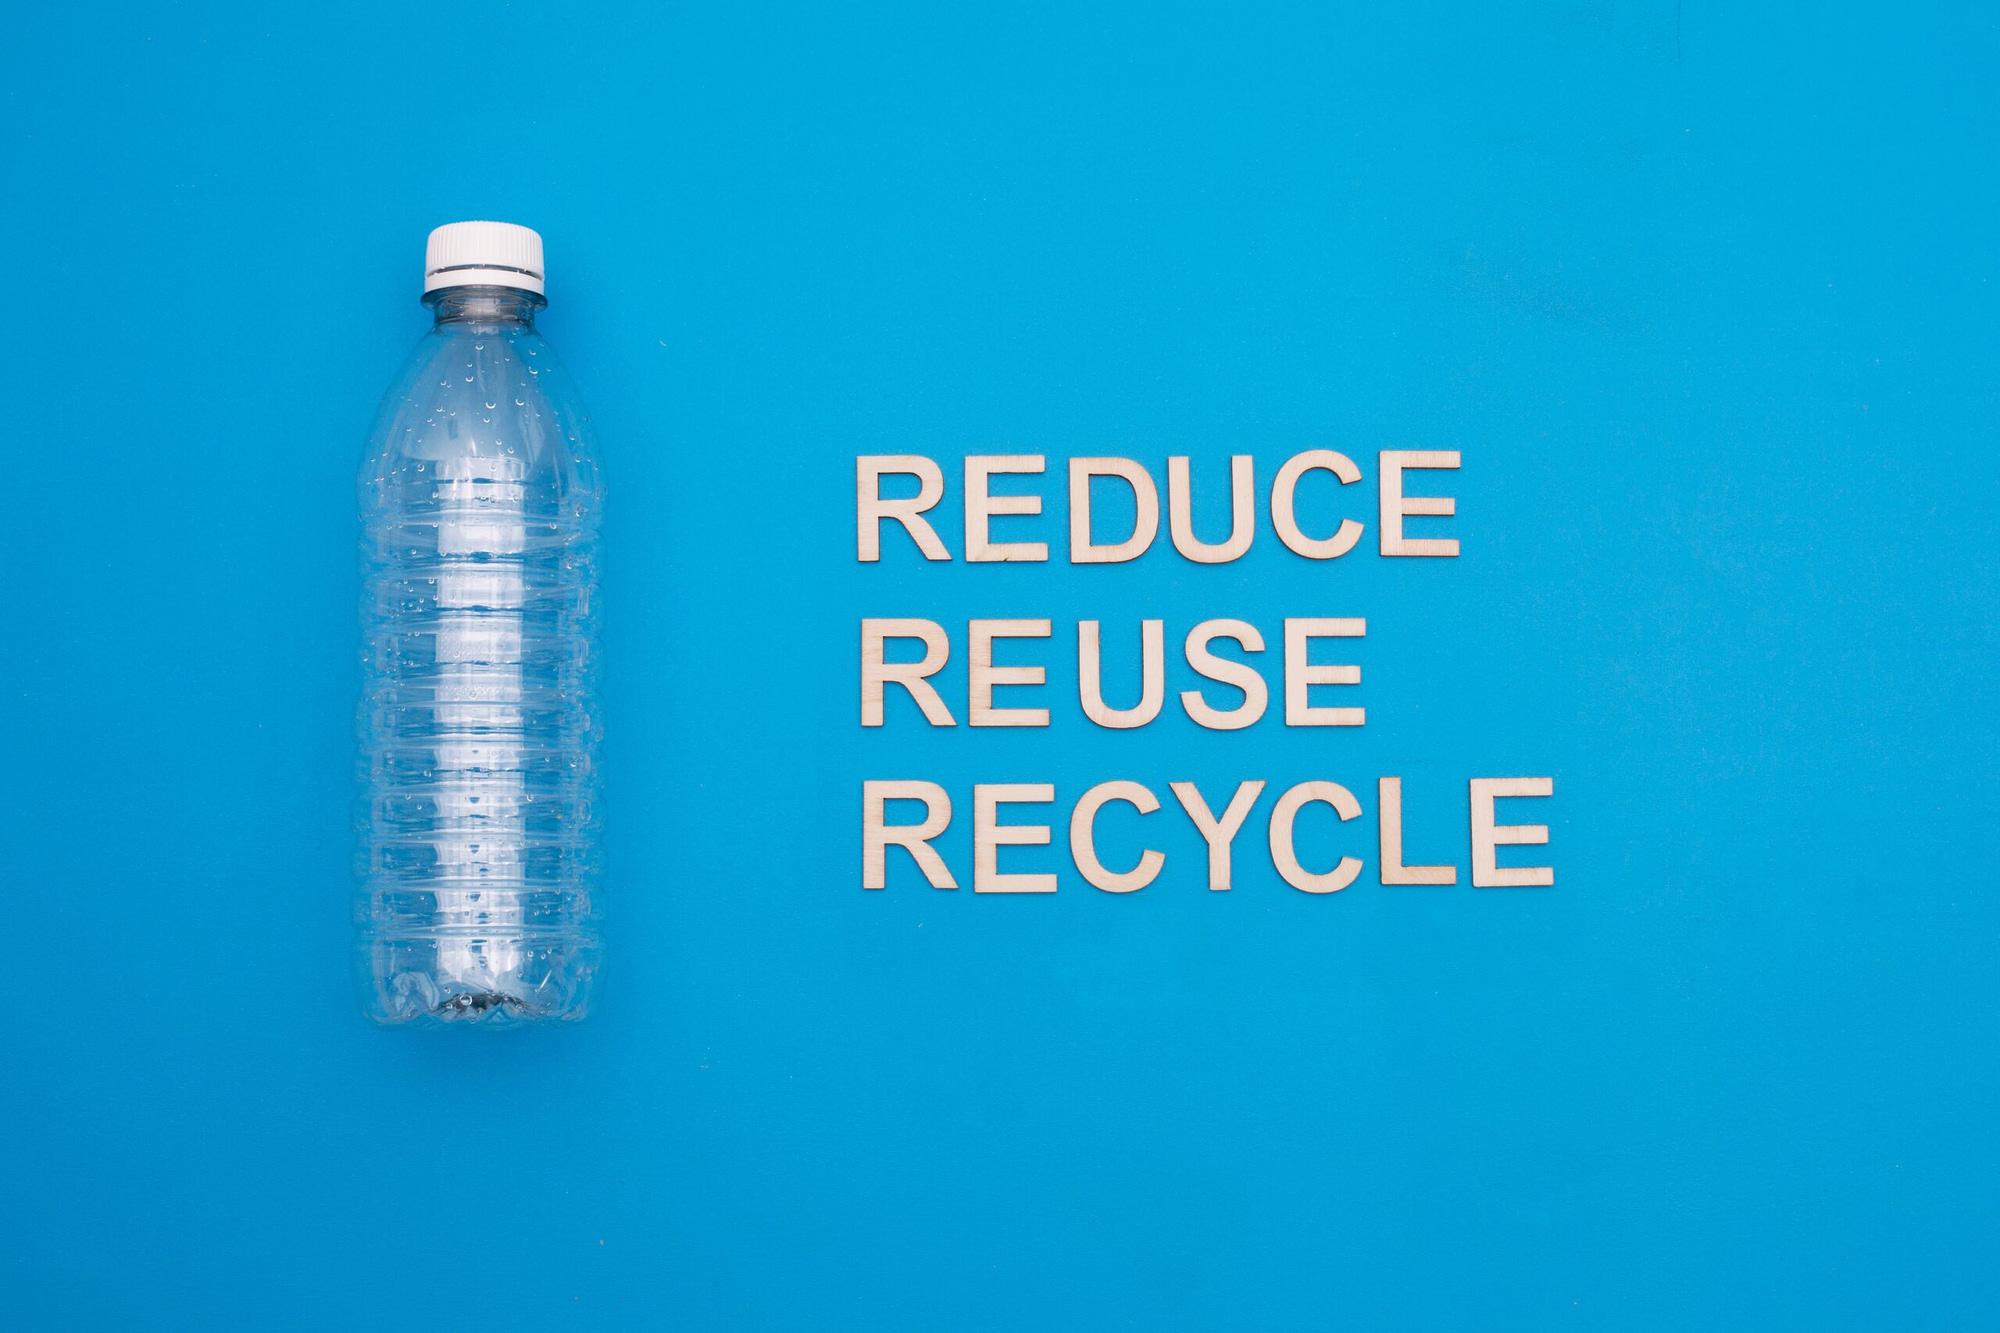 Reduce our reliance on single use plastics